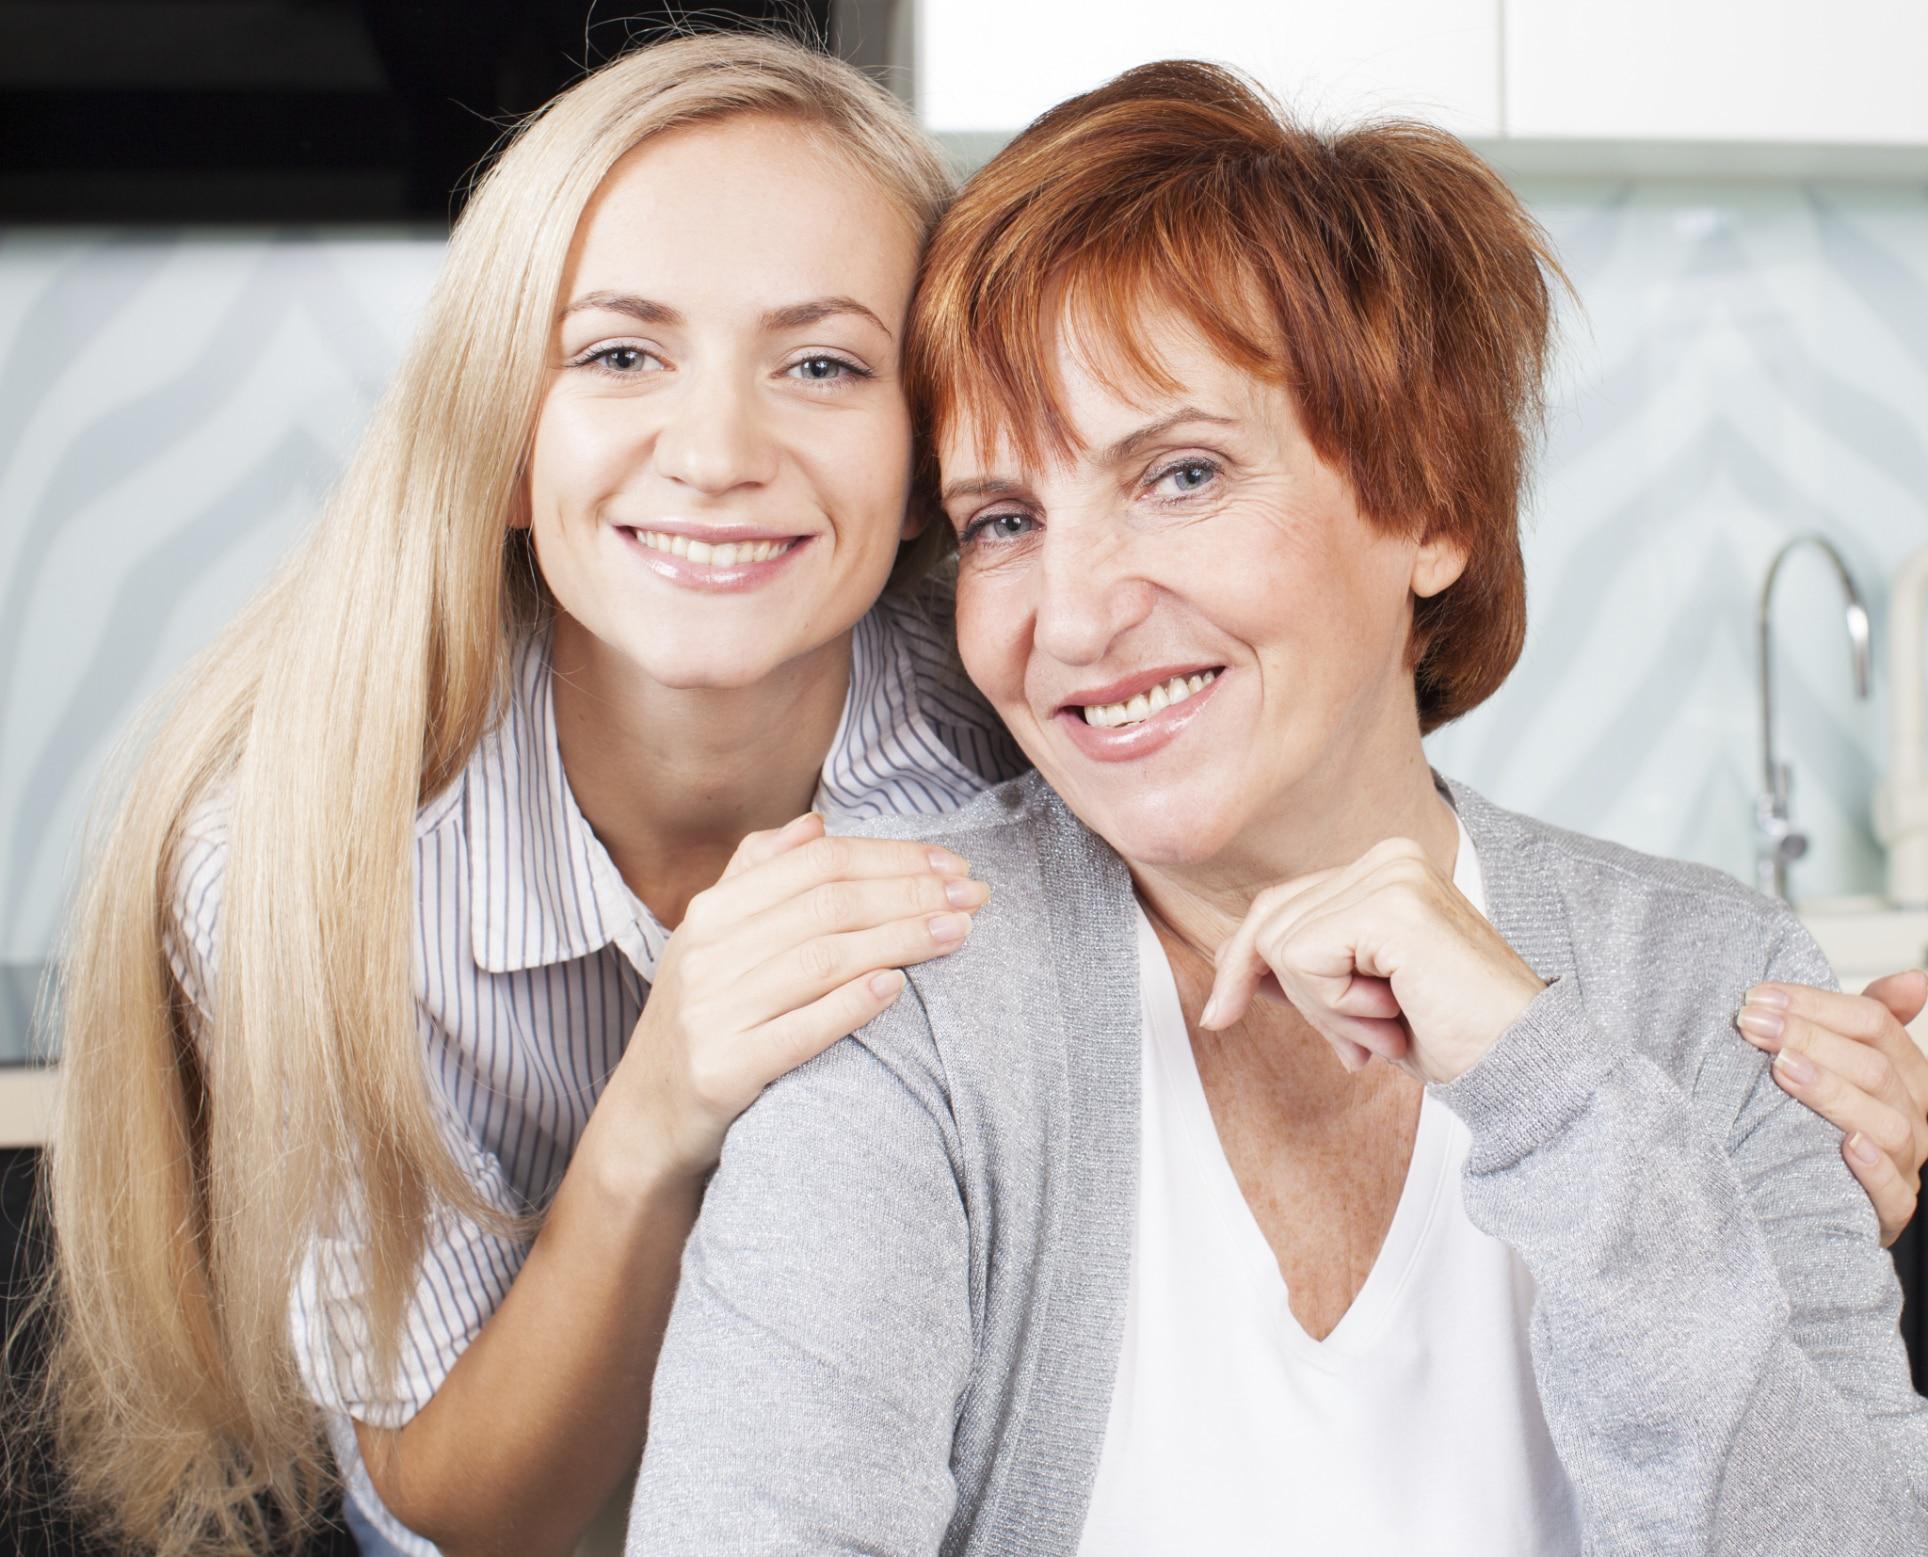 Enjoy life again with dental implants!